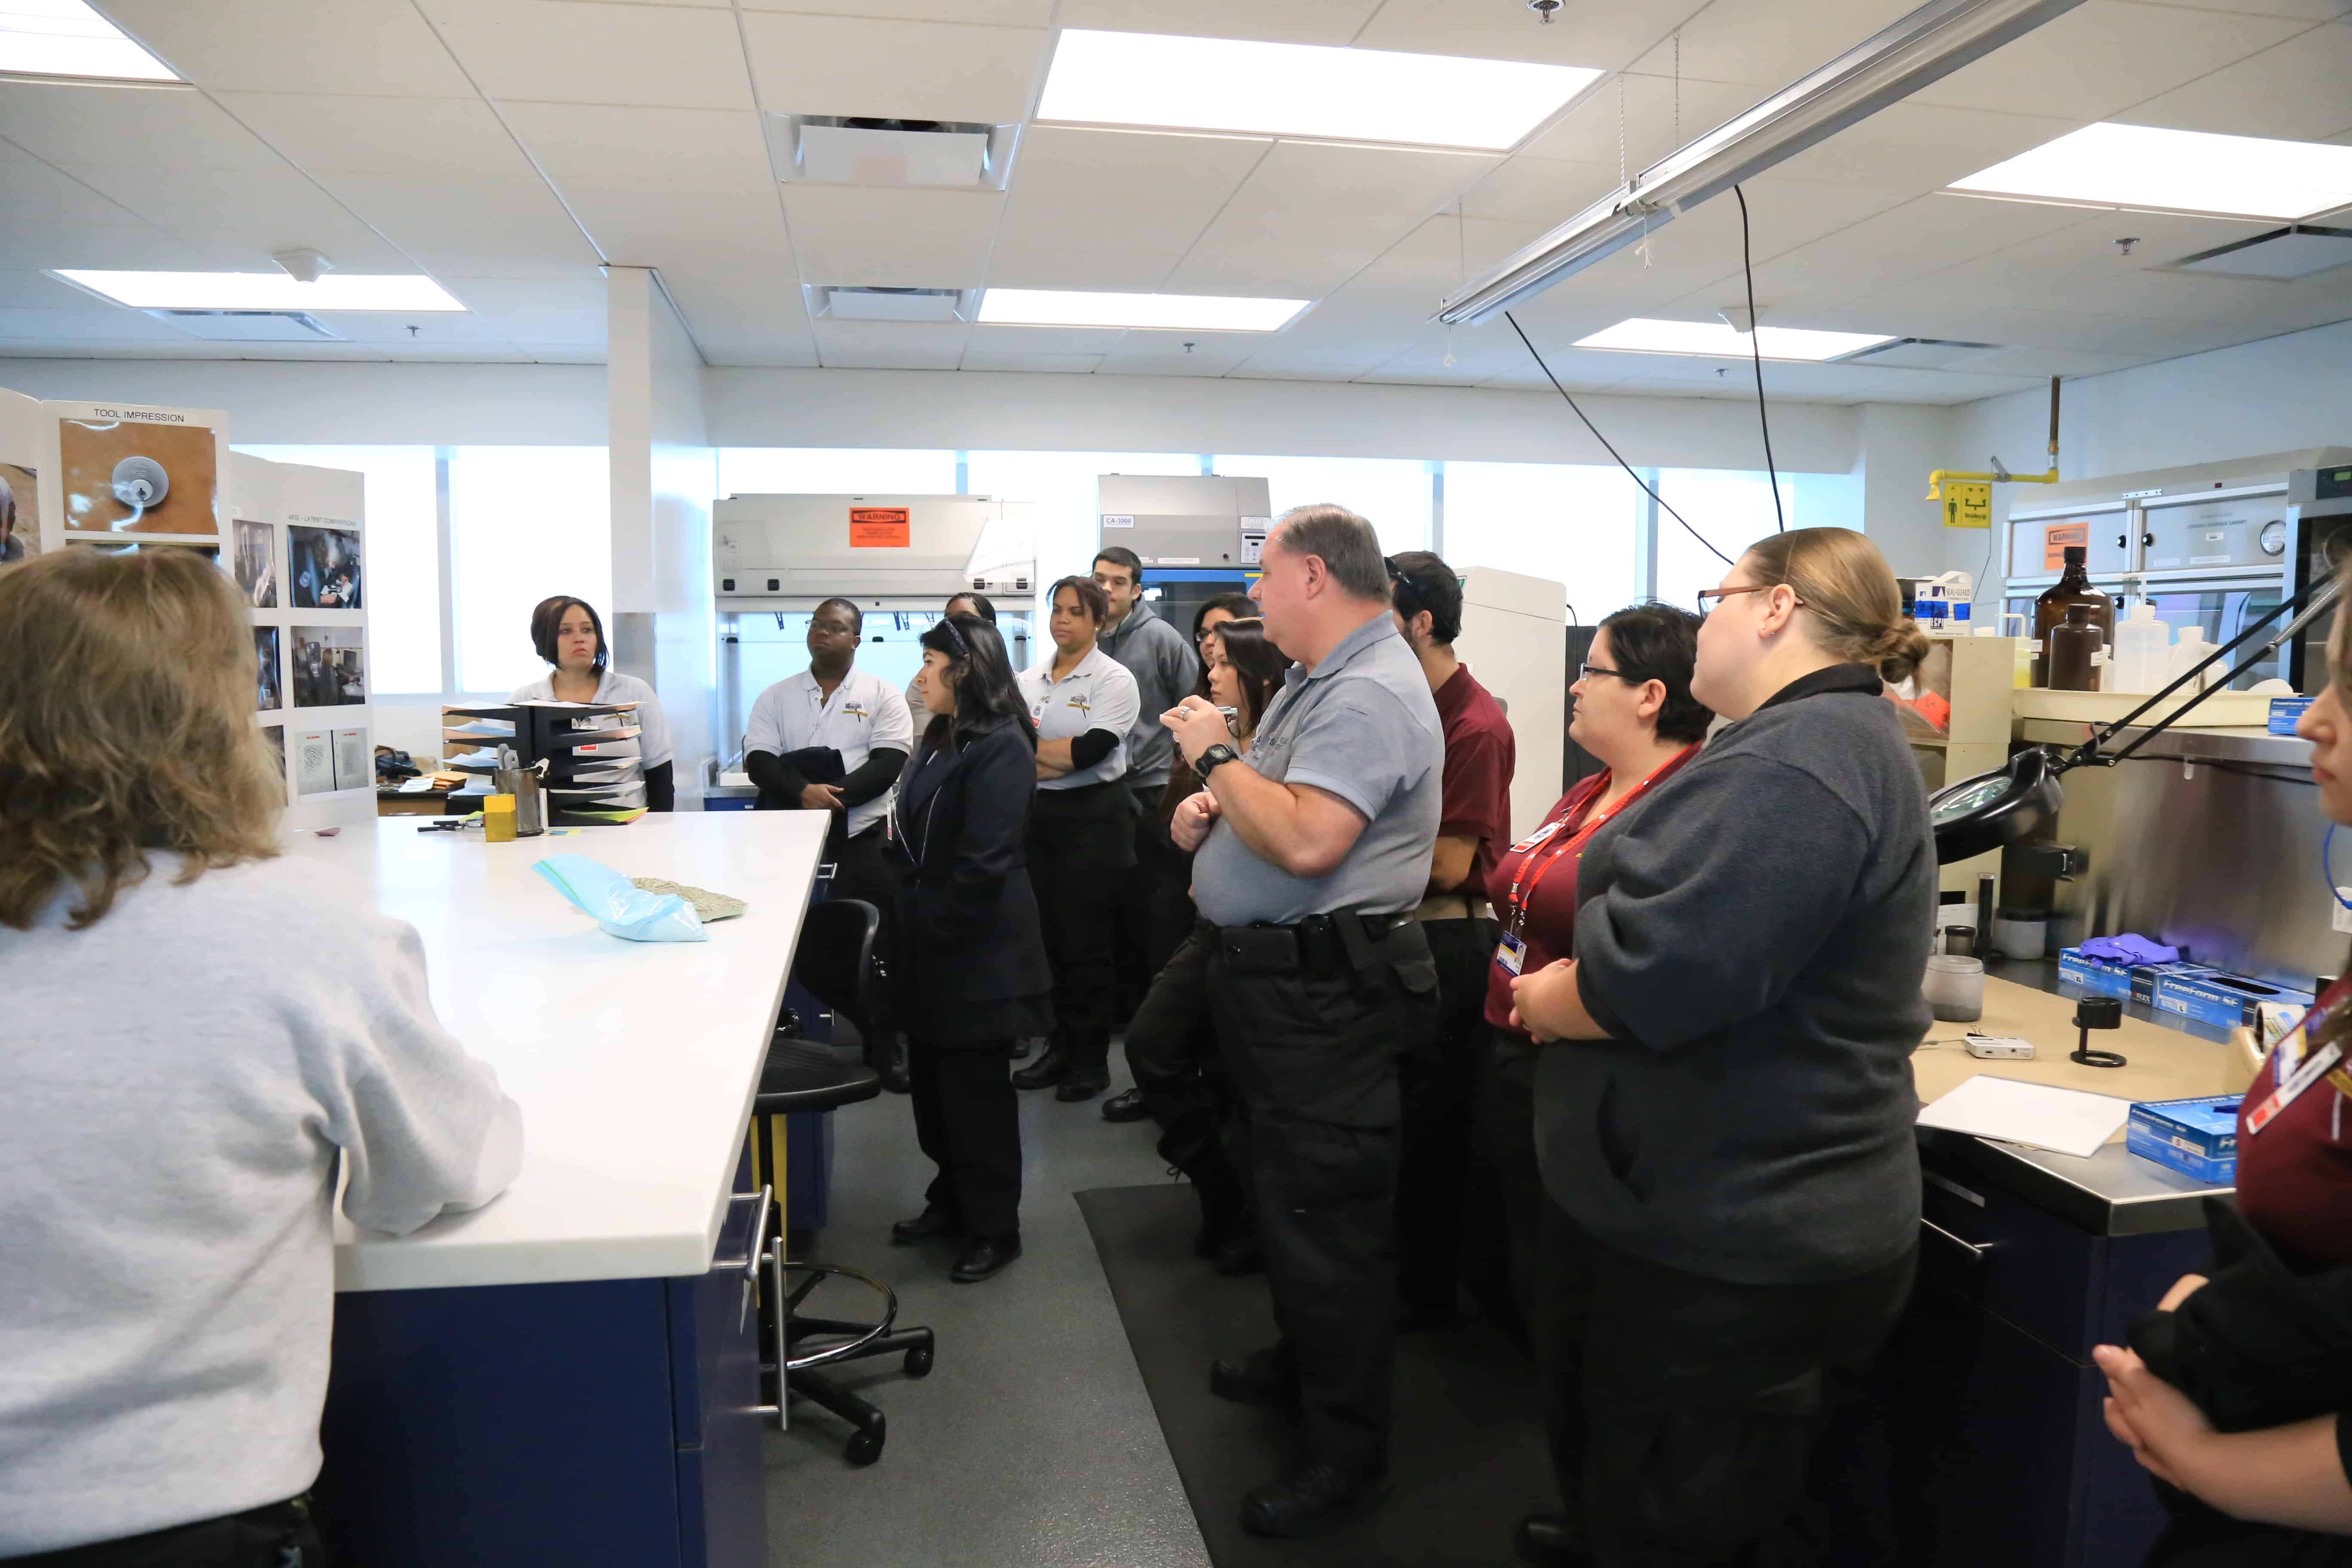 Sarasota Students Visit the Sarasota Police Department's Crime Lab